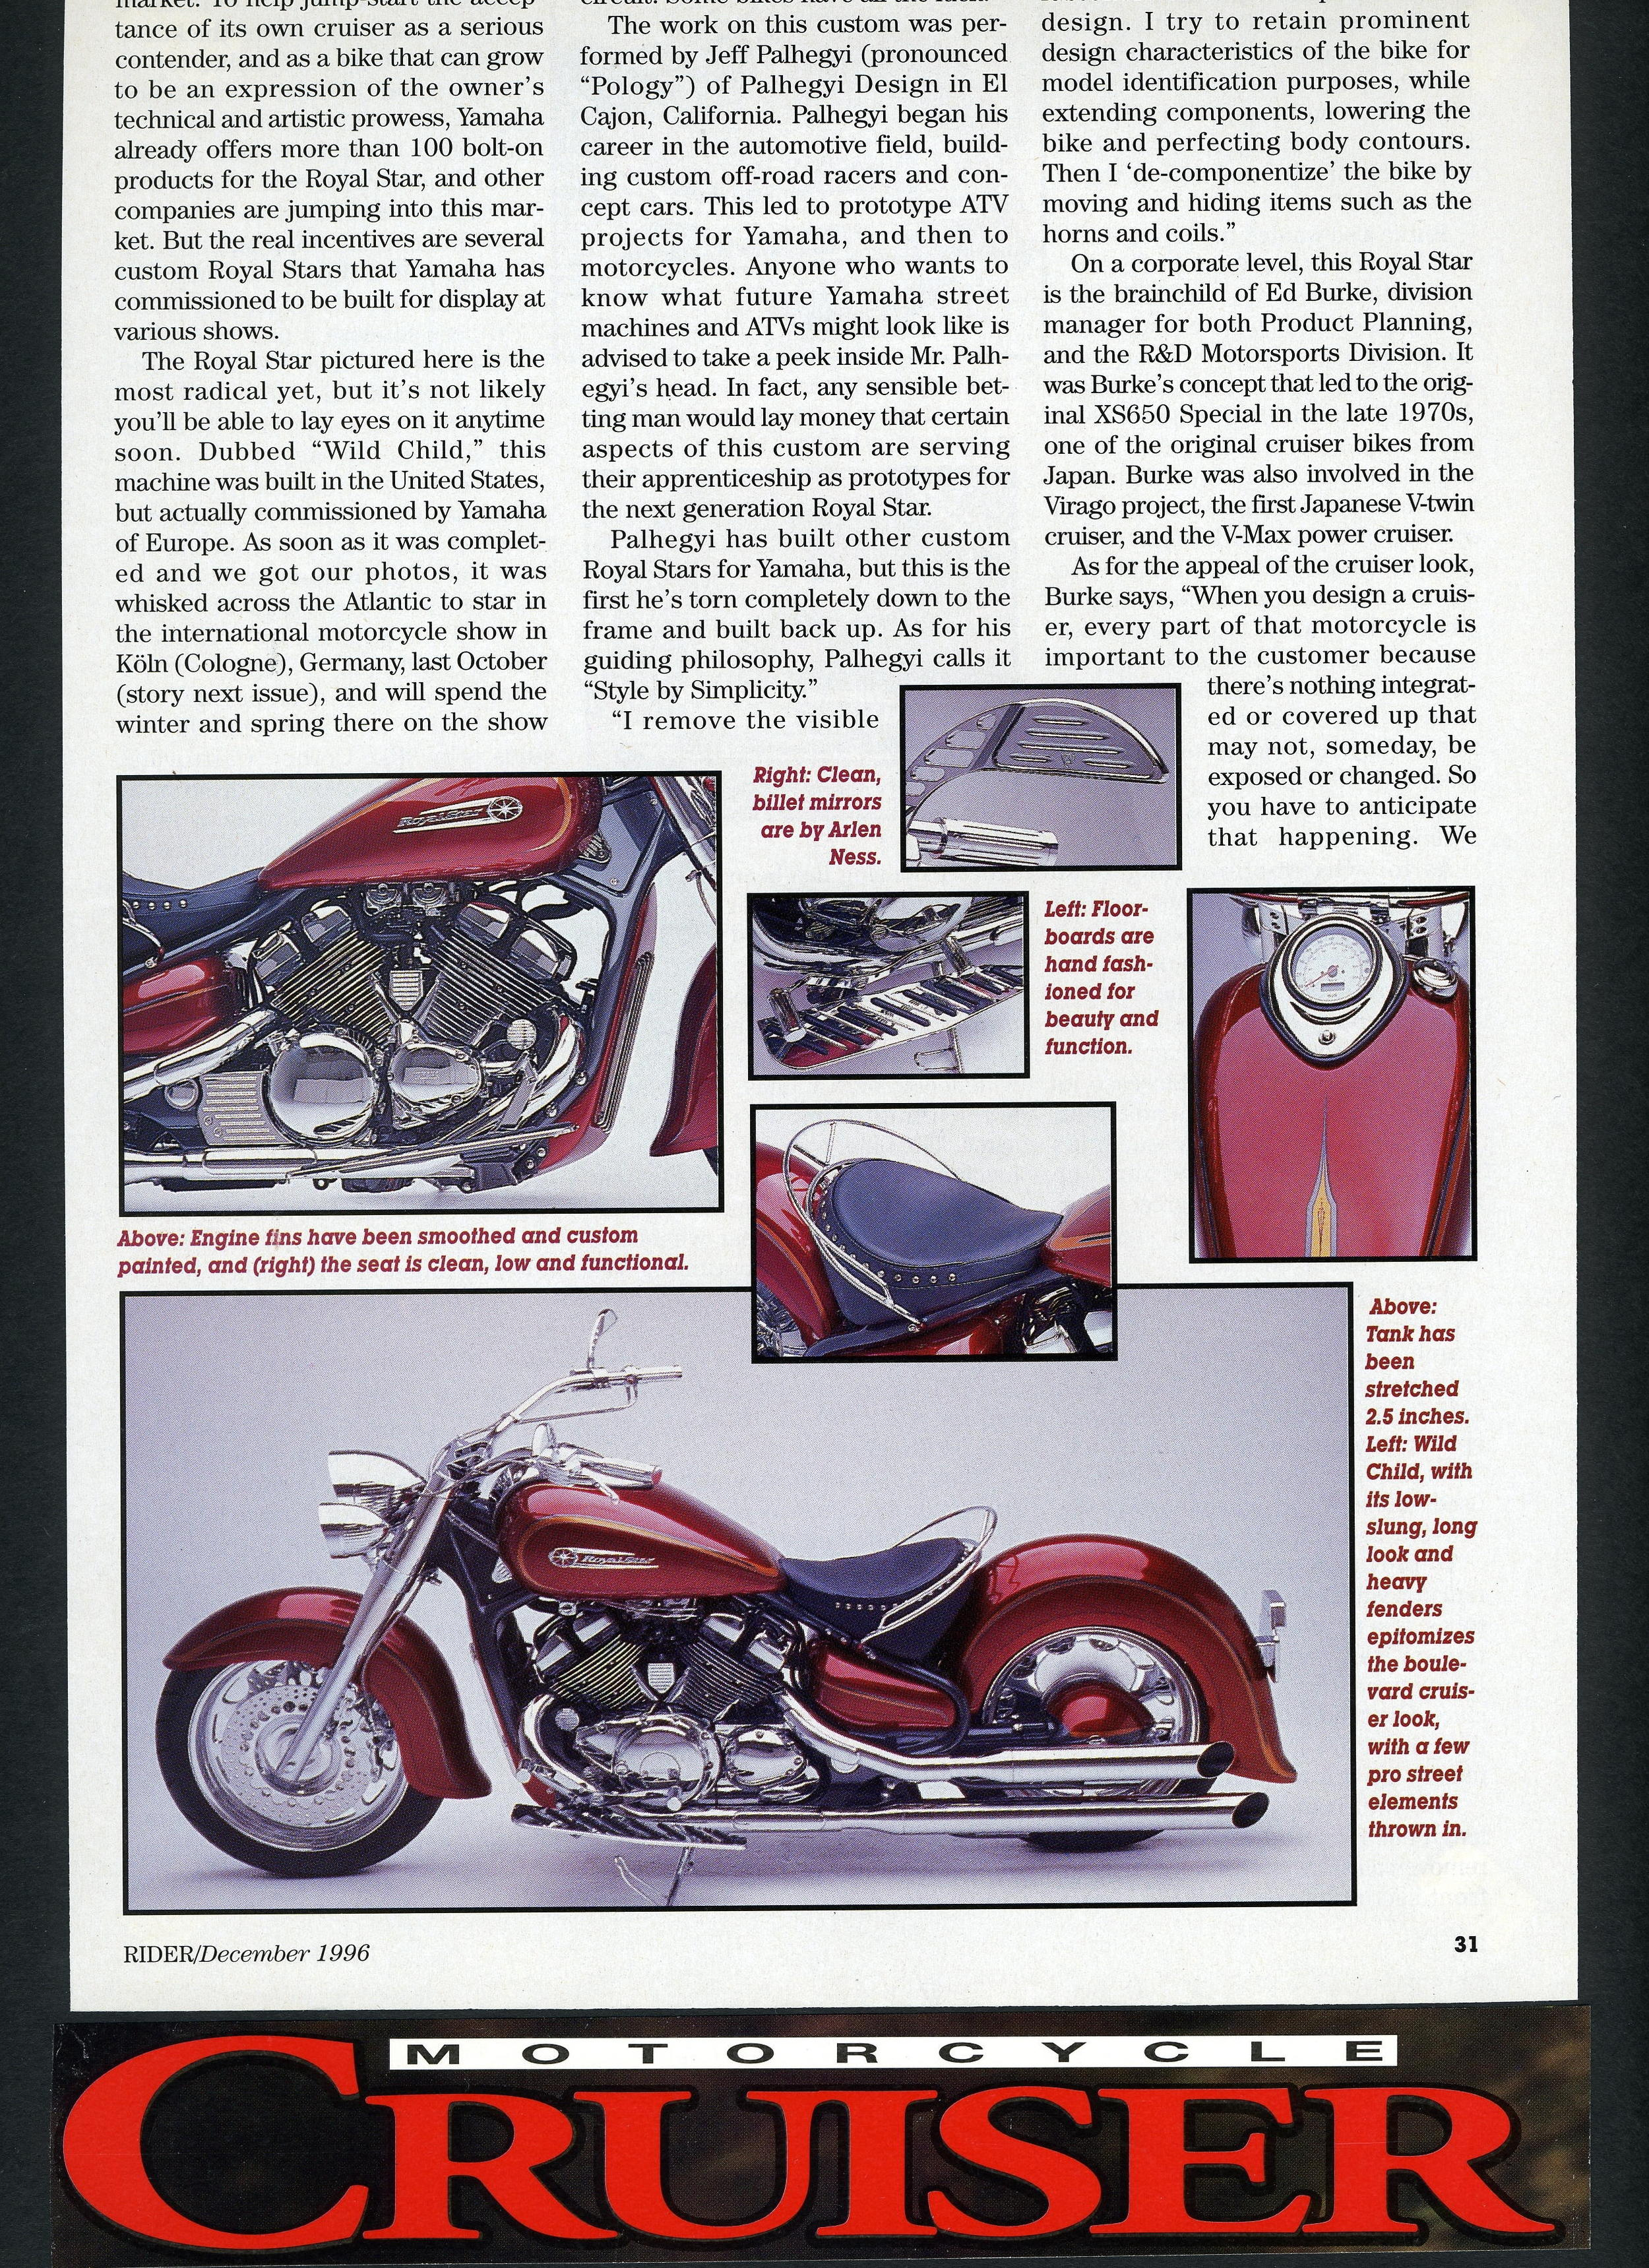 Copy of Jeff Palhegyi Design0113.jpg